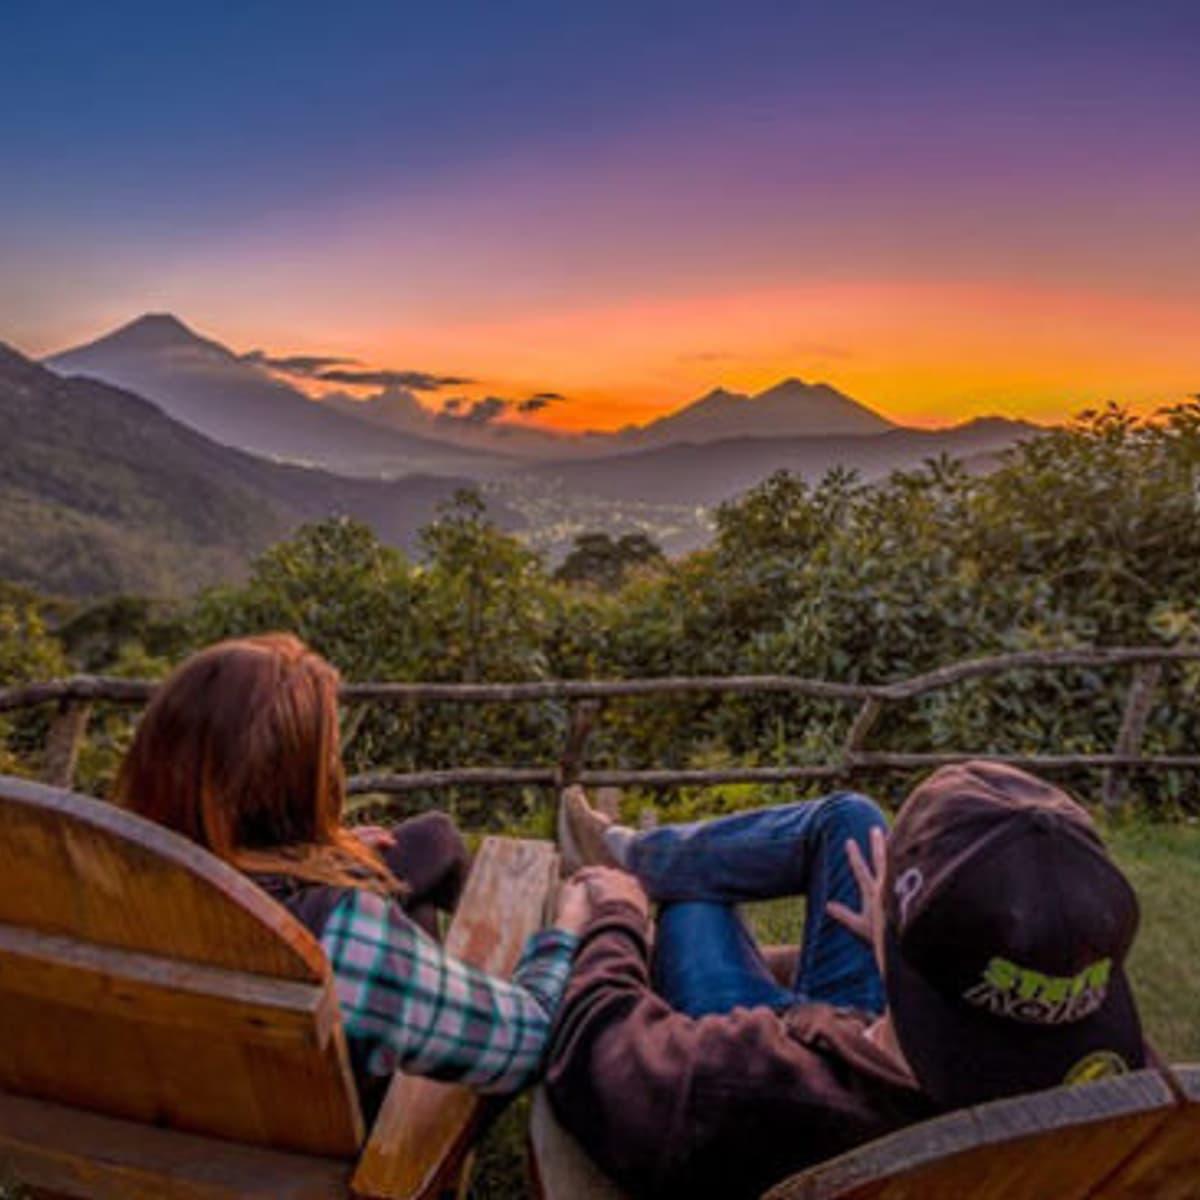 Guatemala Earth Lodge Sunset View during custom Guatemala tour